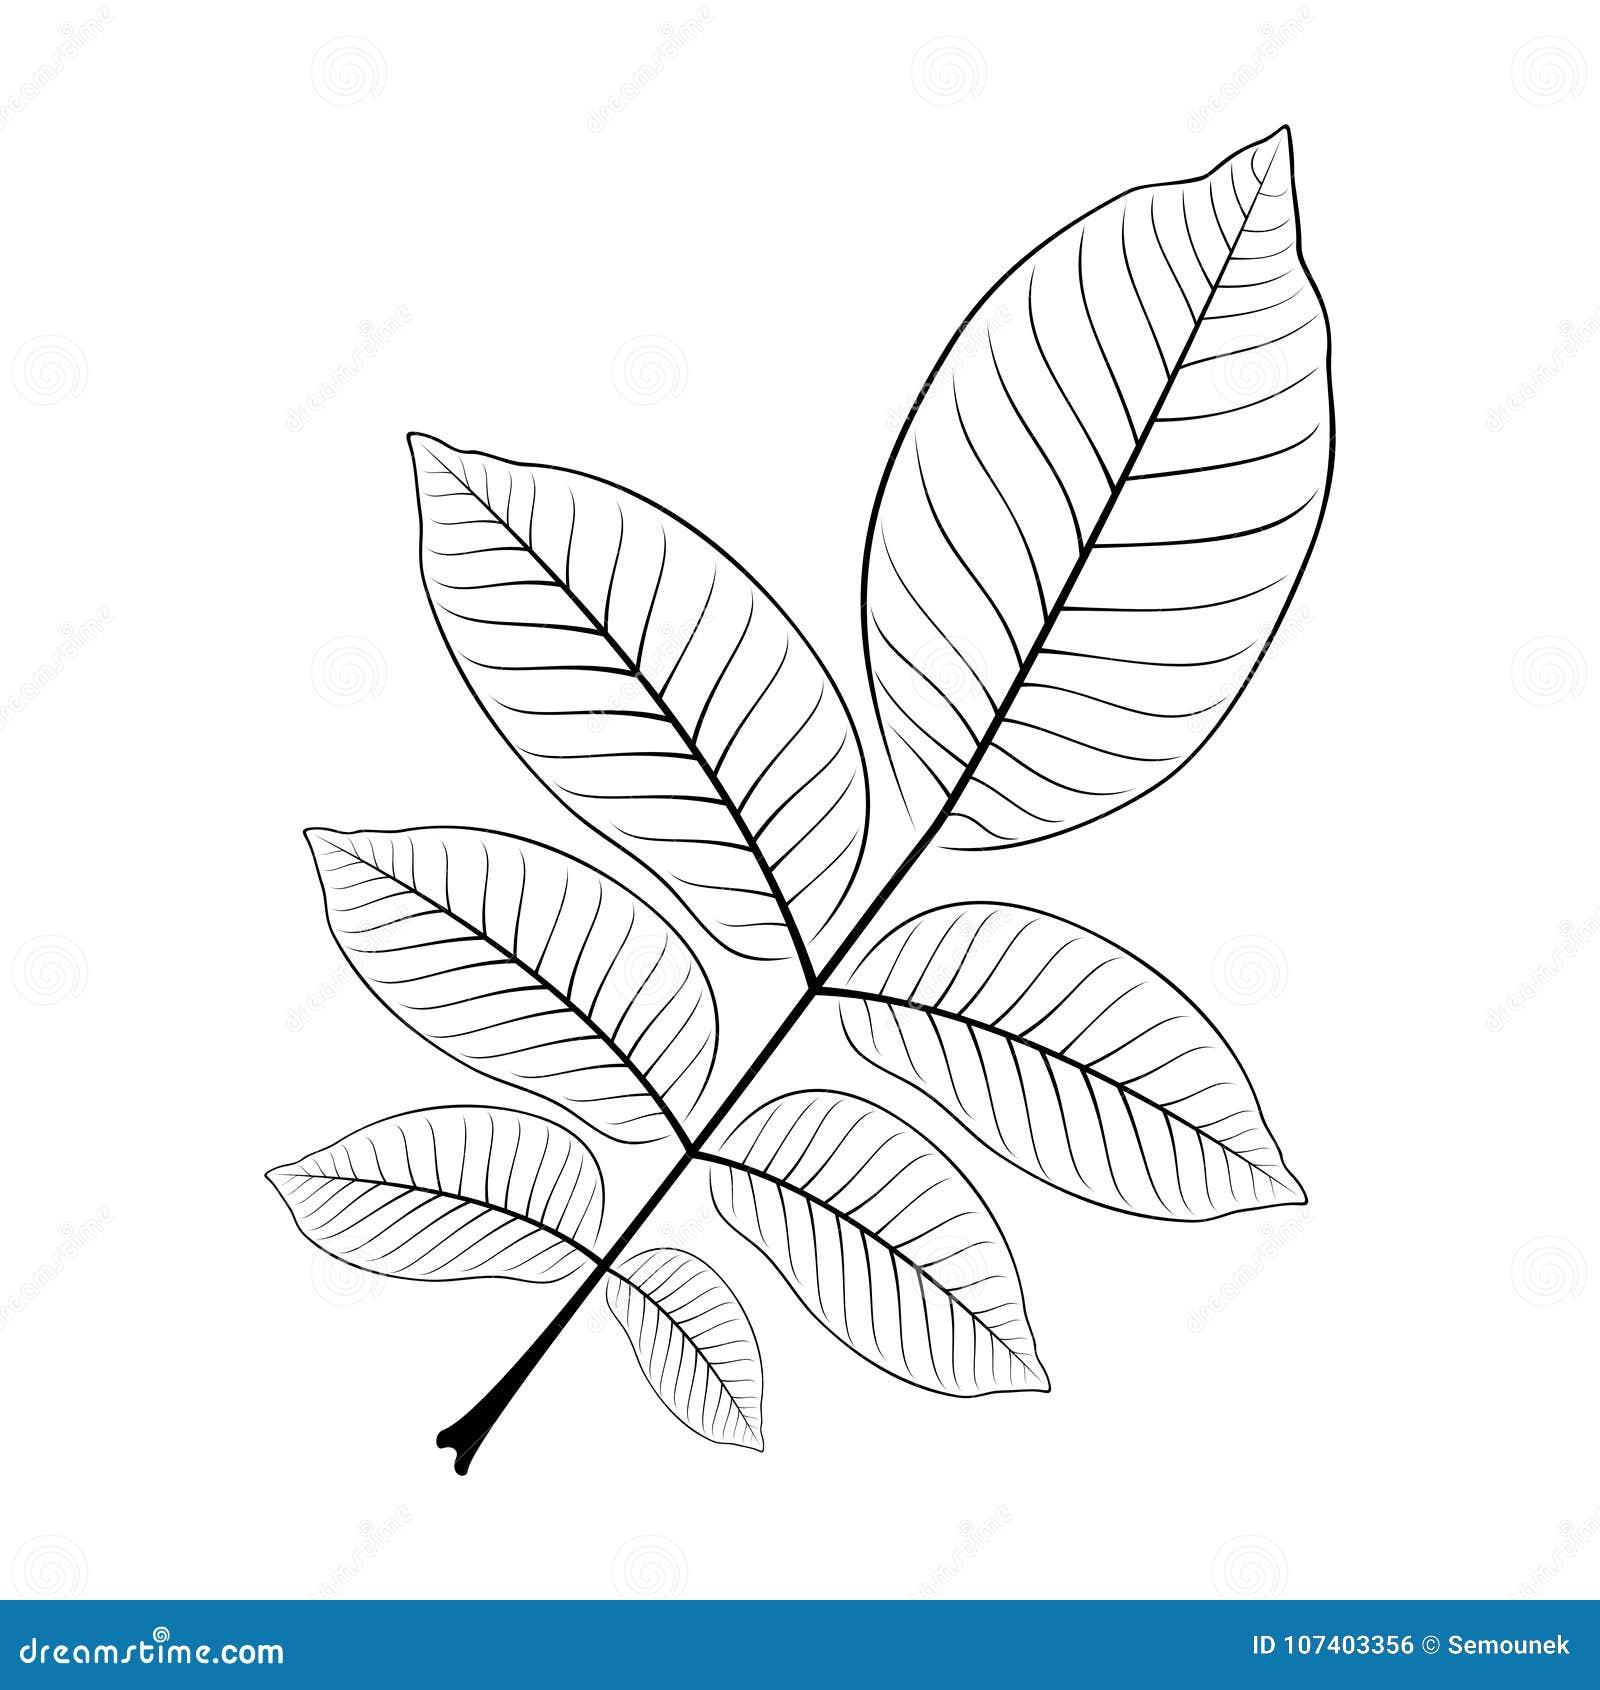 Black and white vector illustration of a walnut leaf